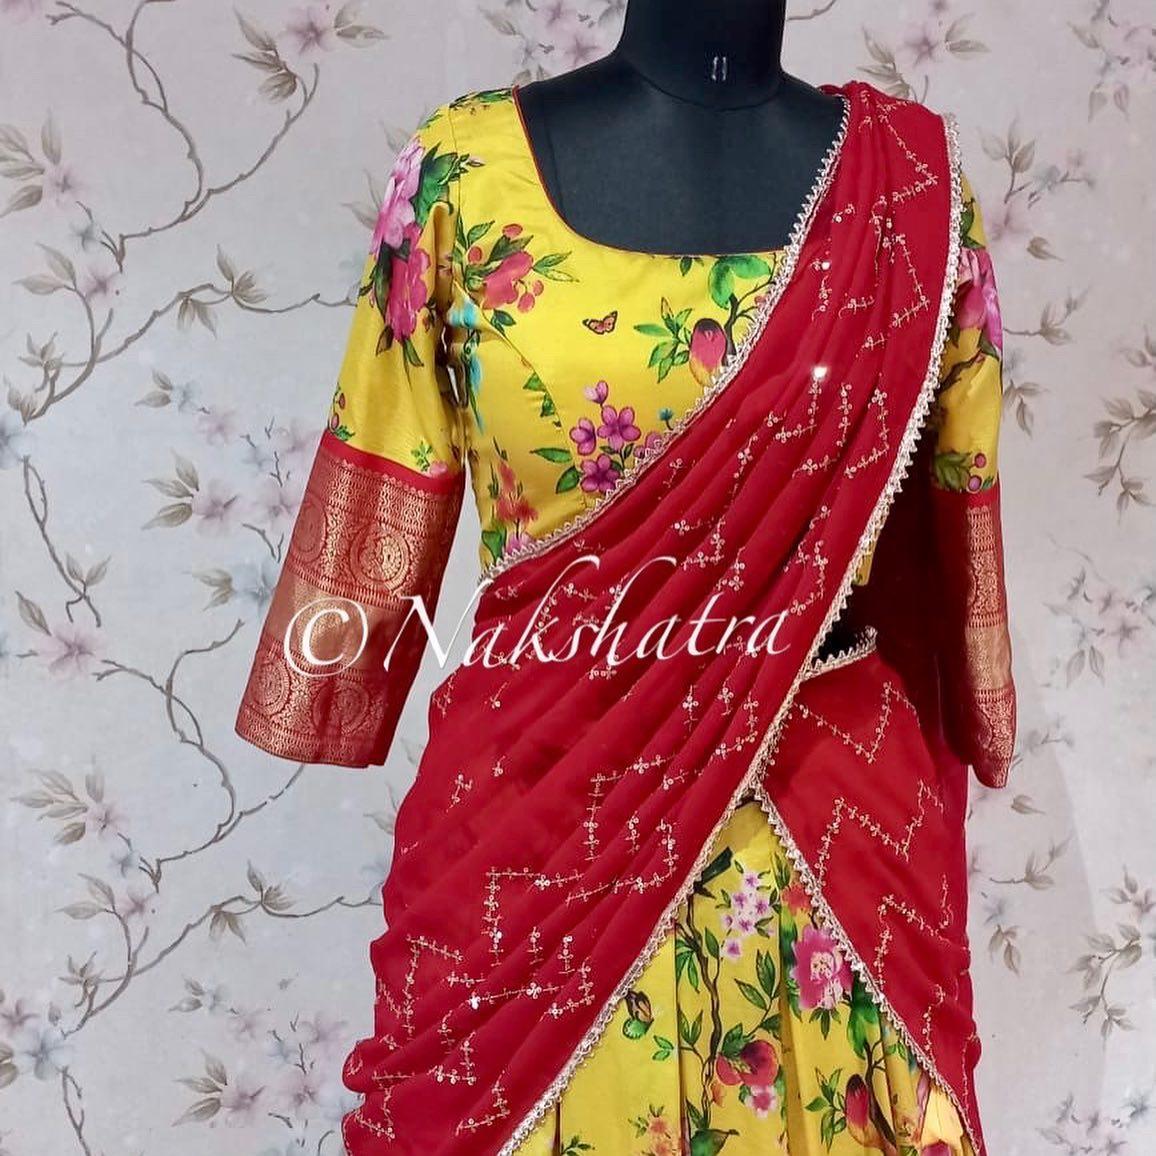 Flaunt this upcoming SravanaMaasam with  Stunning yellow kanchi floral lehangas